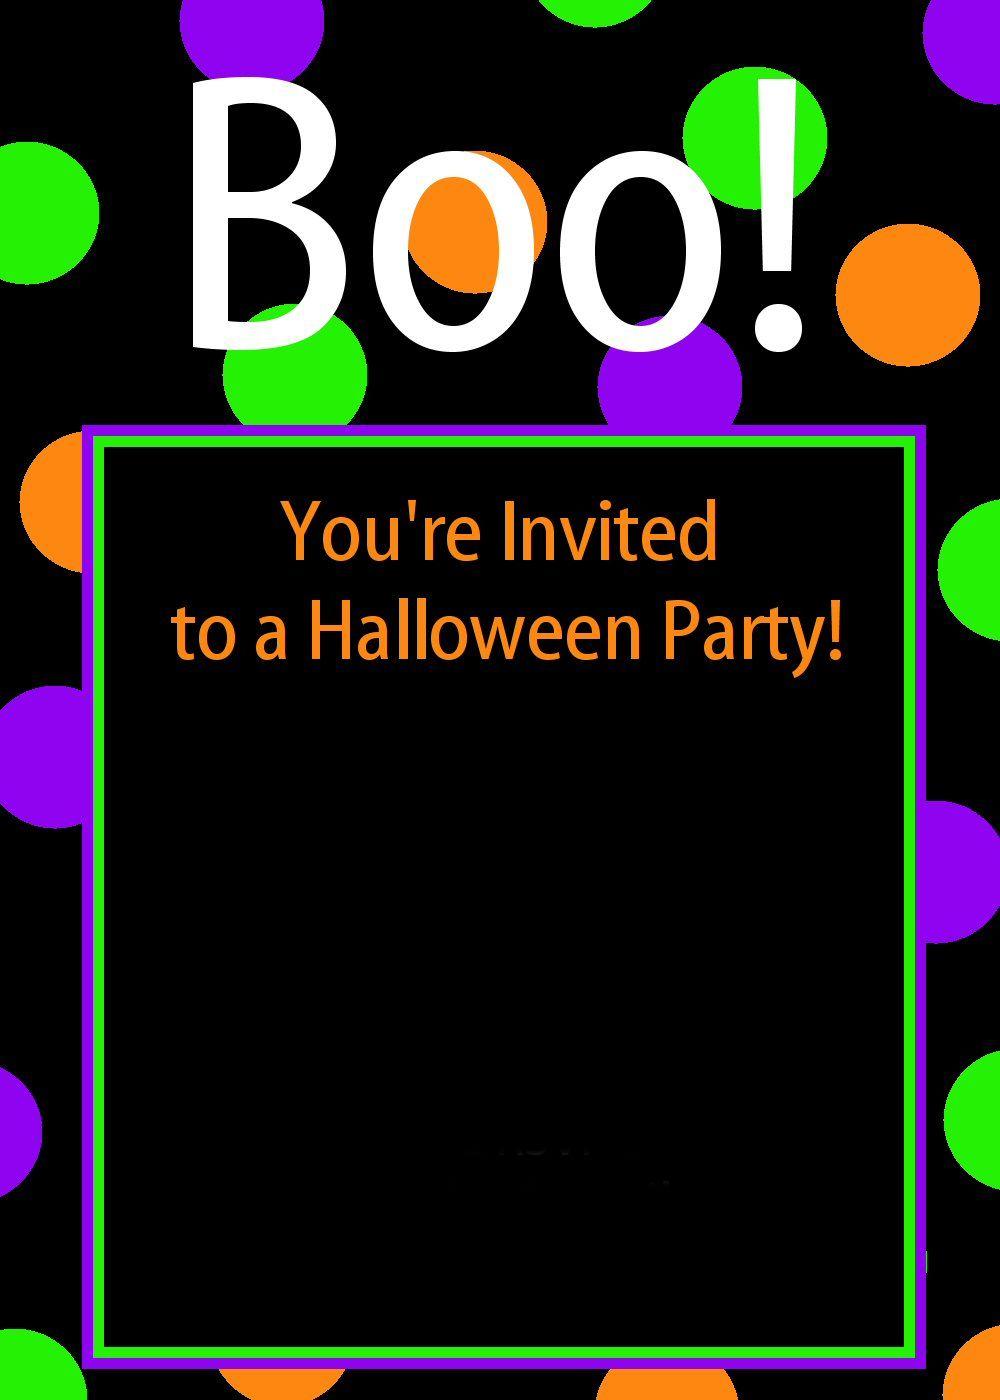 Cute Free Printable Halloween Invitations – Fun-Squared - Halloween Invitations Free Printable Black And White